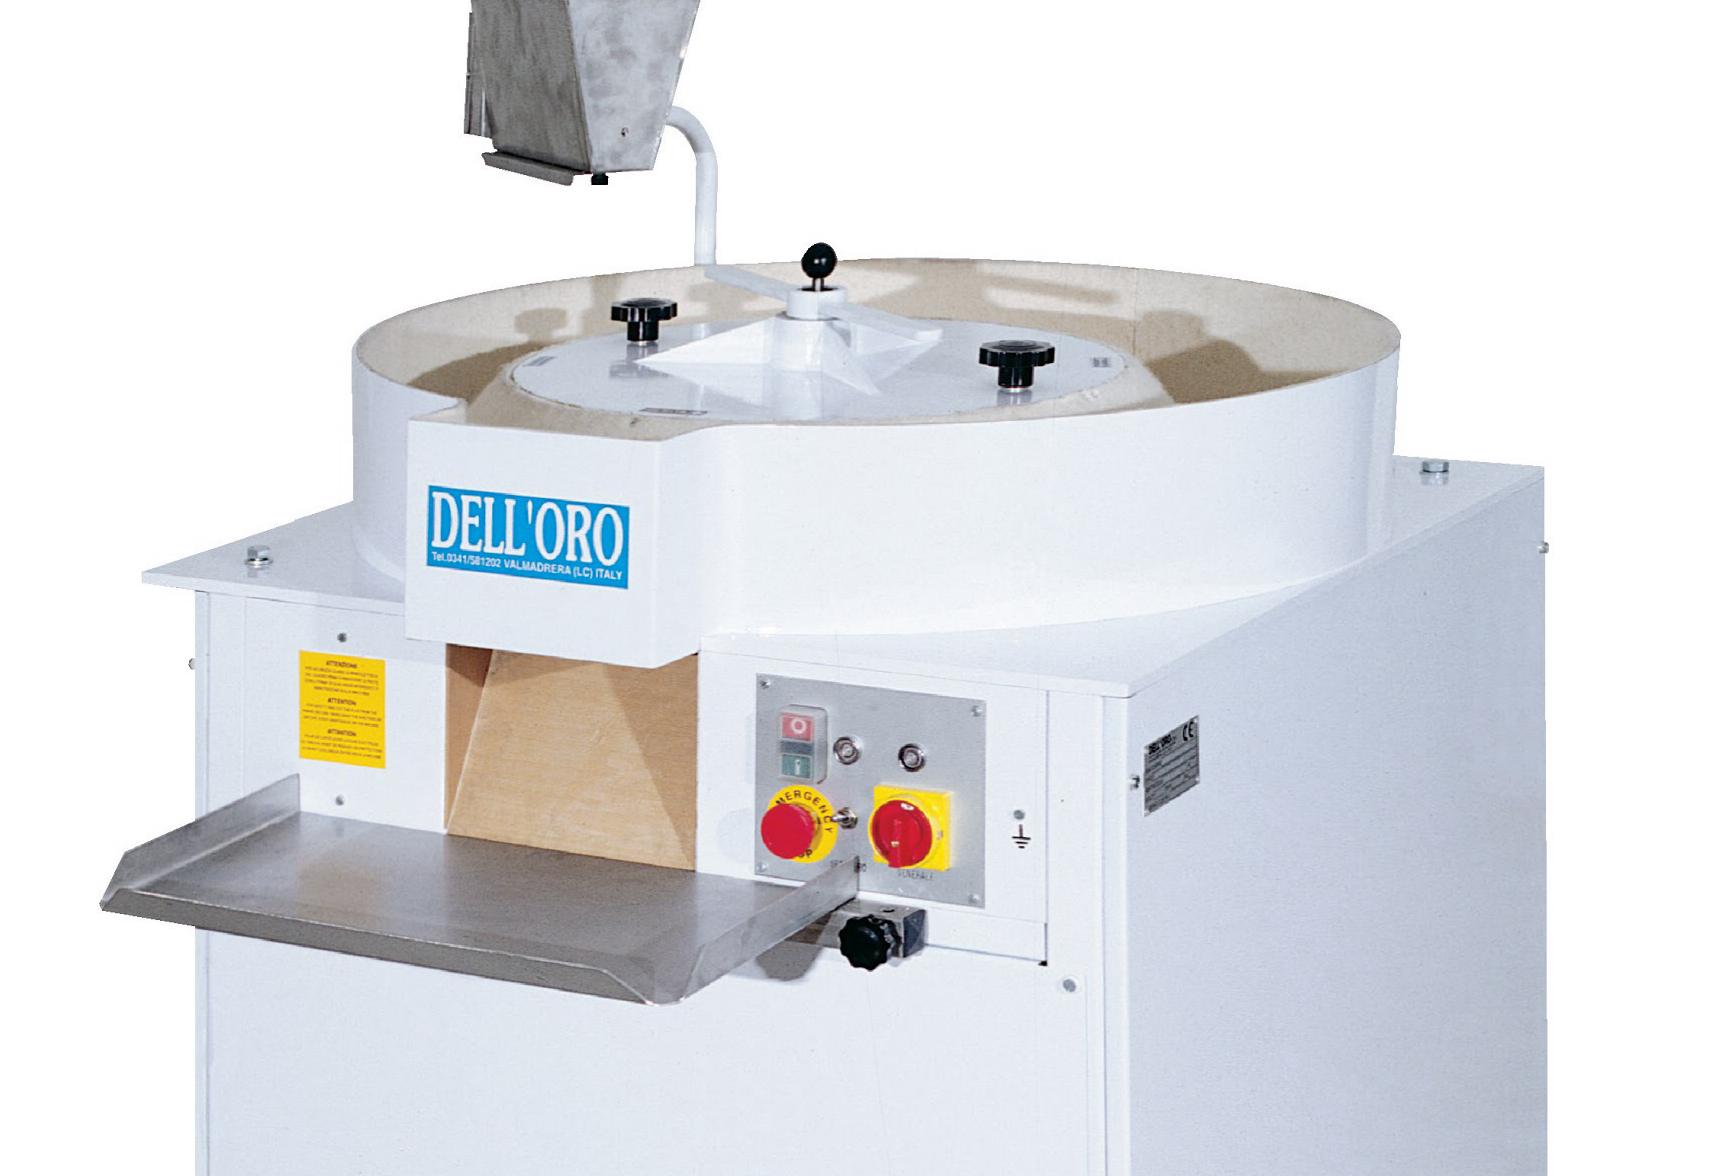 Creed-DellOro-orbital-dough-rounderJPG.JPG